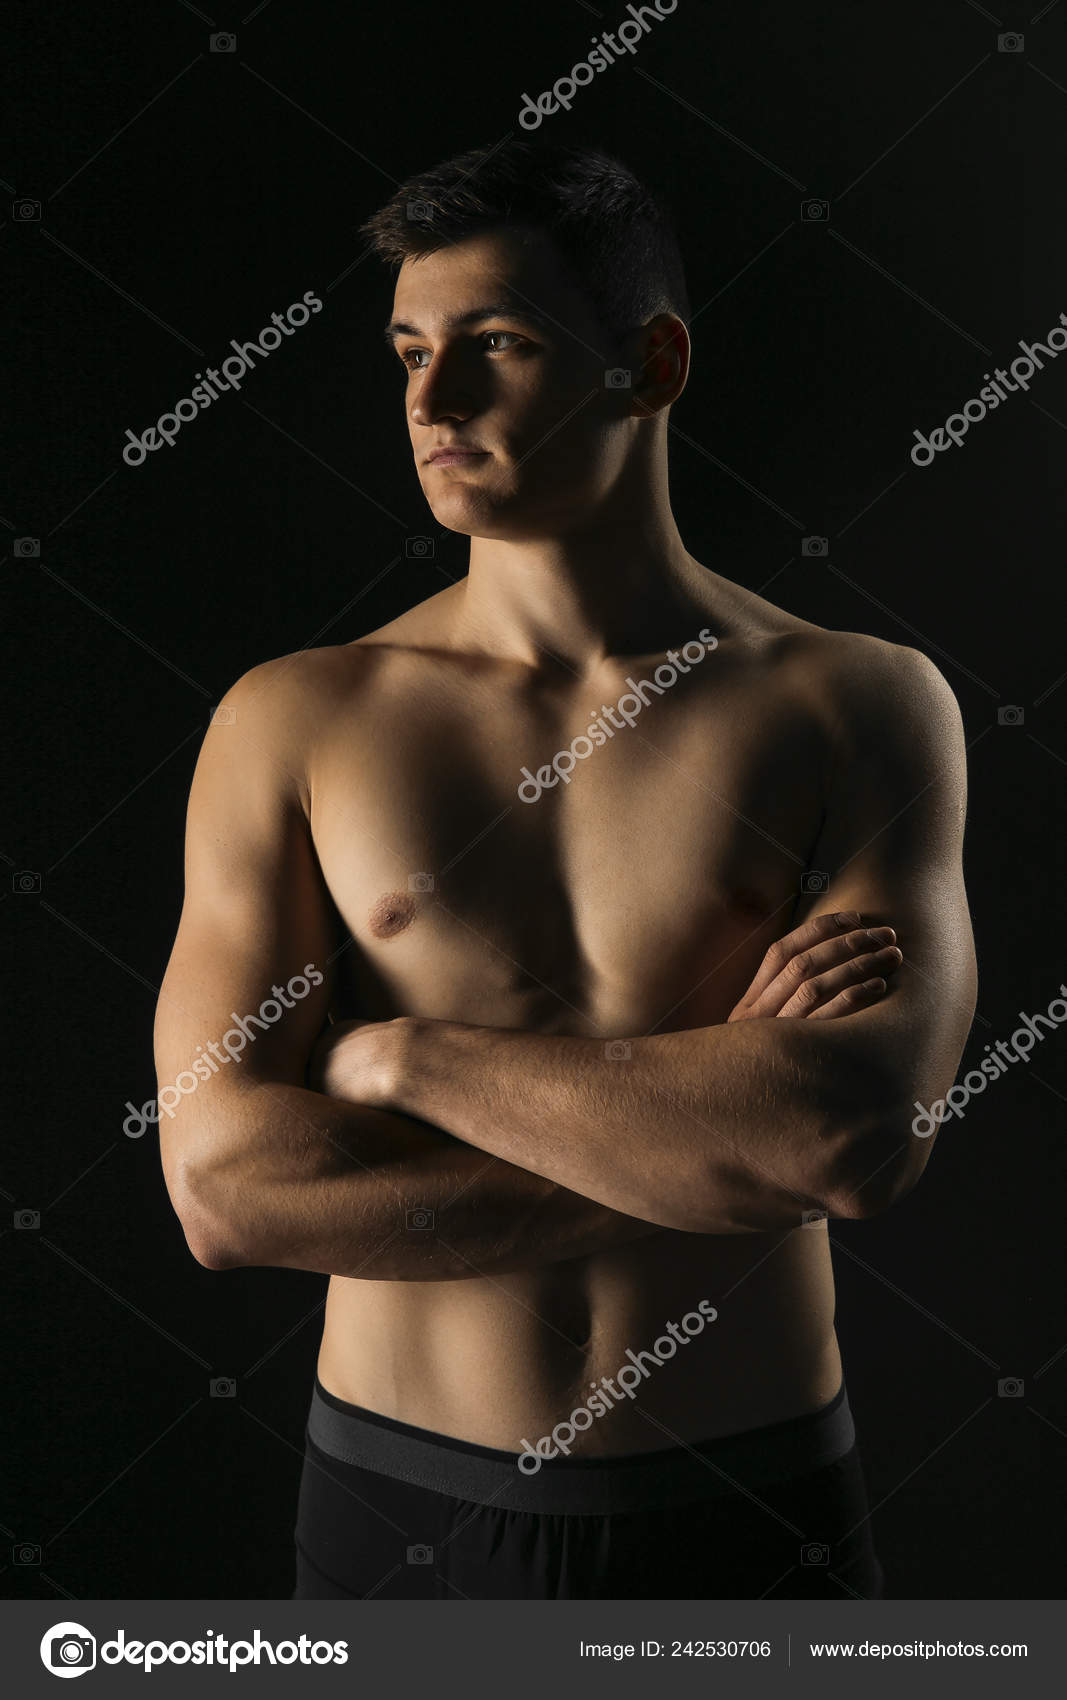 Naked athletic body Portrait Man Beautiful Athletic Body Low Key Well Built Guy Stock Photo By C Logvinyukyuliia 242530706